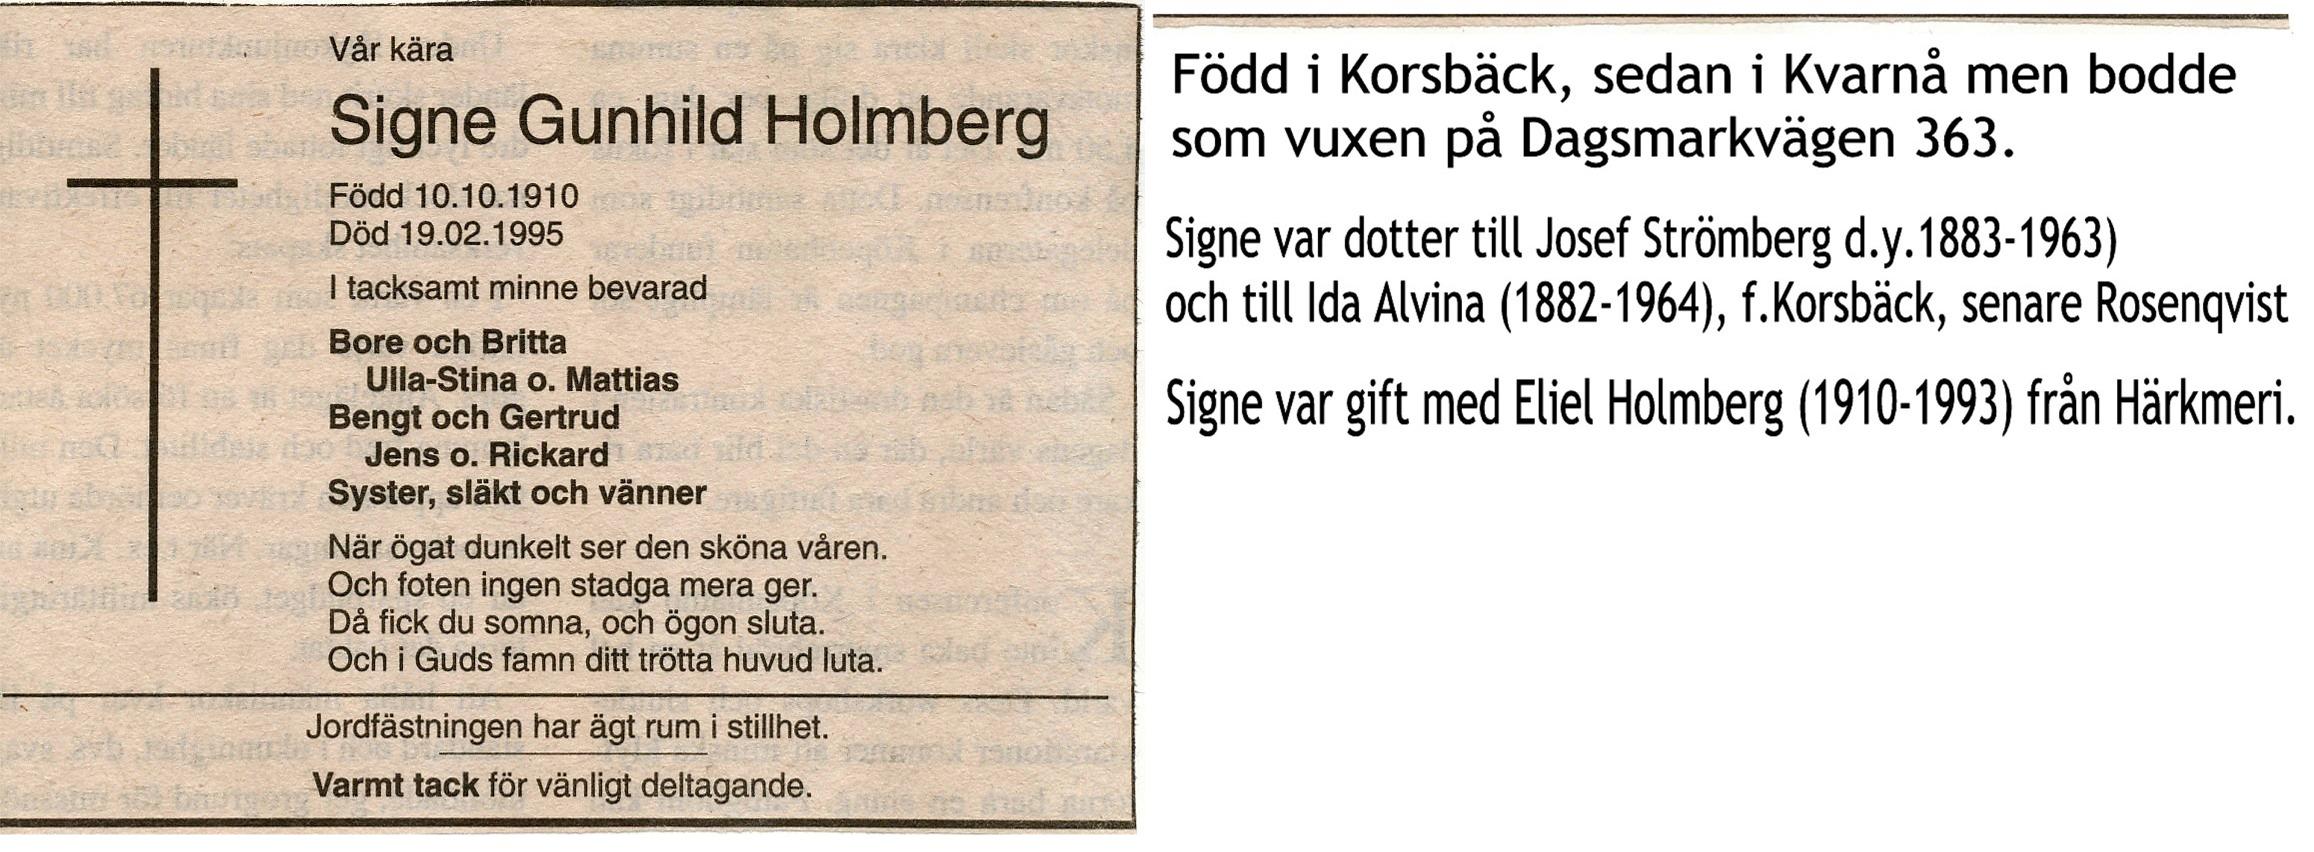 Holmberg Signe Gunhild